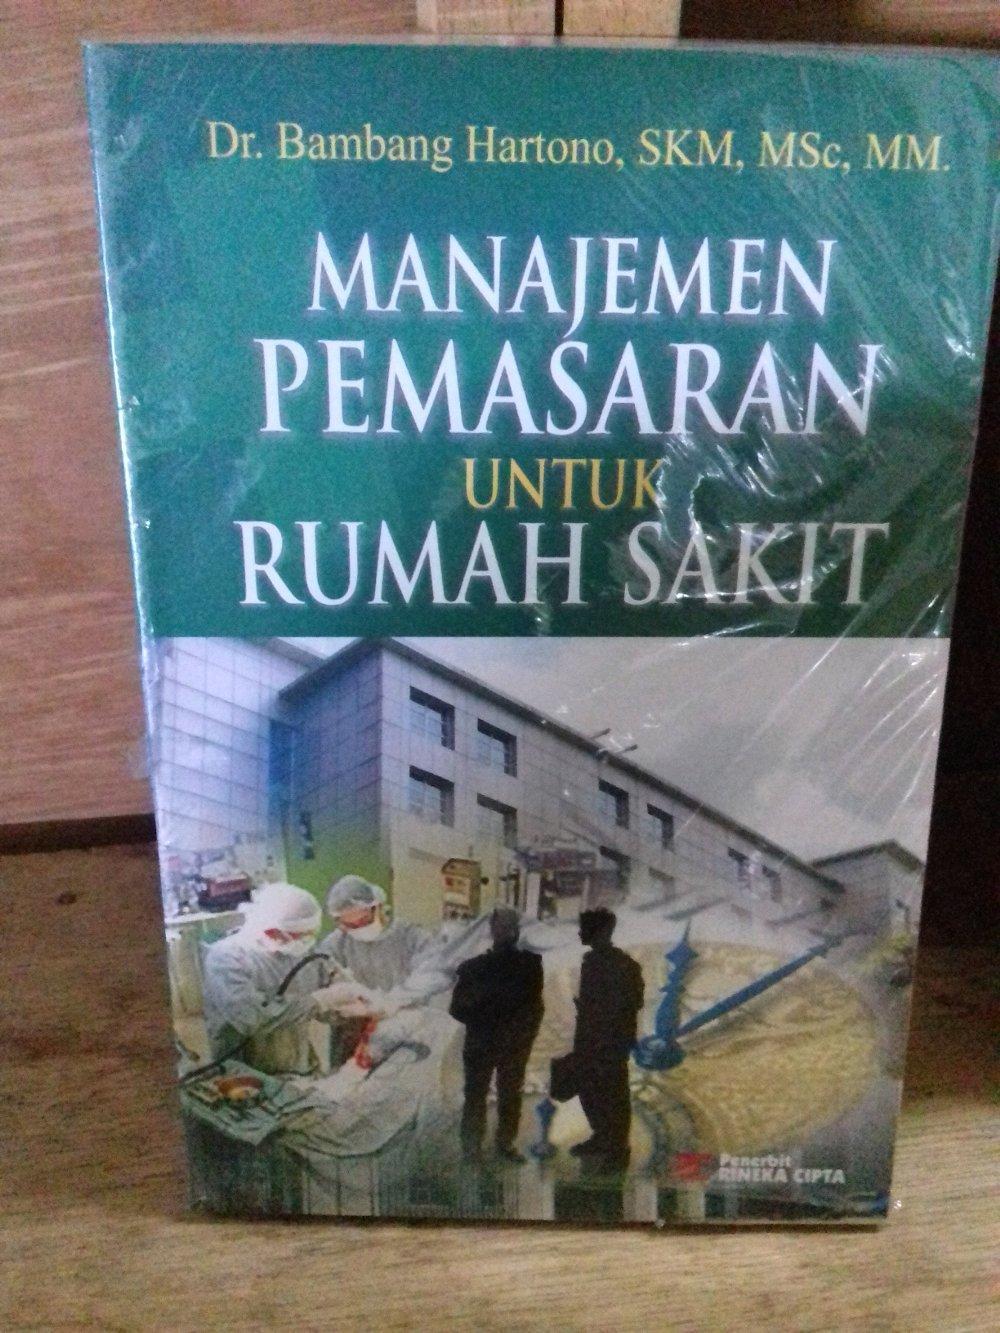 Buku Manajemen Pemasaran Untuk Rumah Sakit - Dr. Bambang Hartono. SKM. MSc